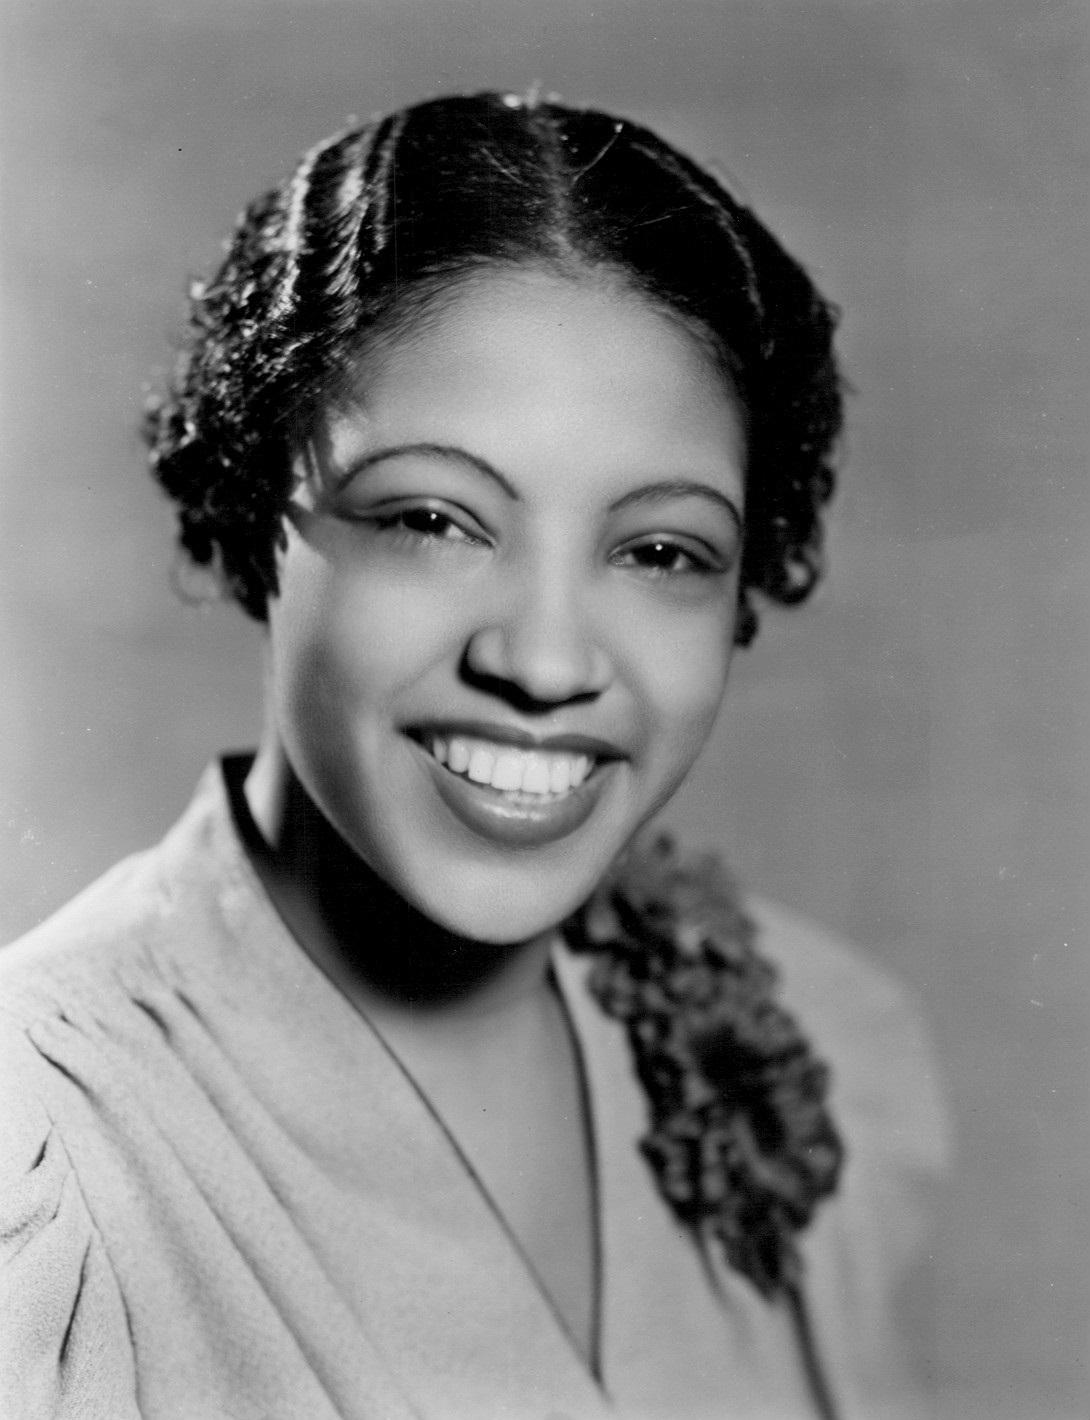 Maxine Sullivan in St. Louis Blues (1939)